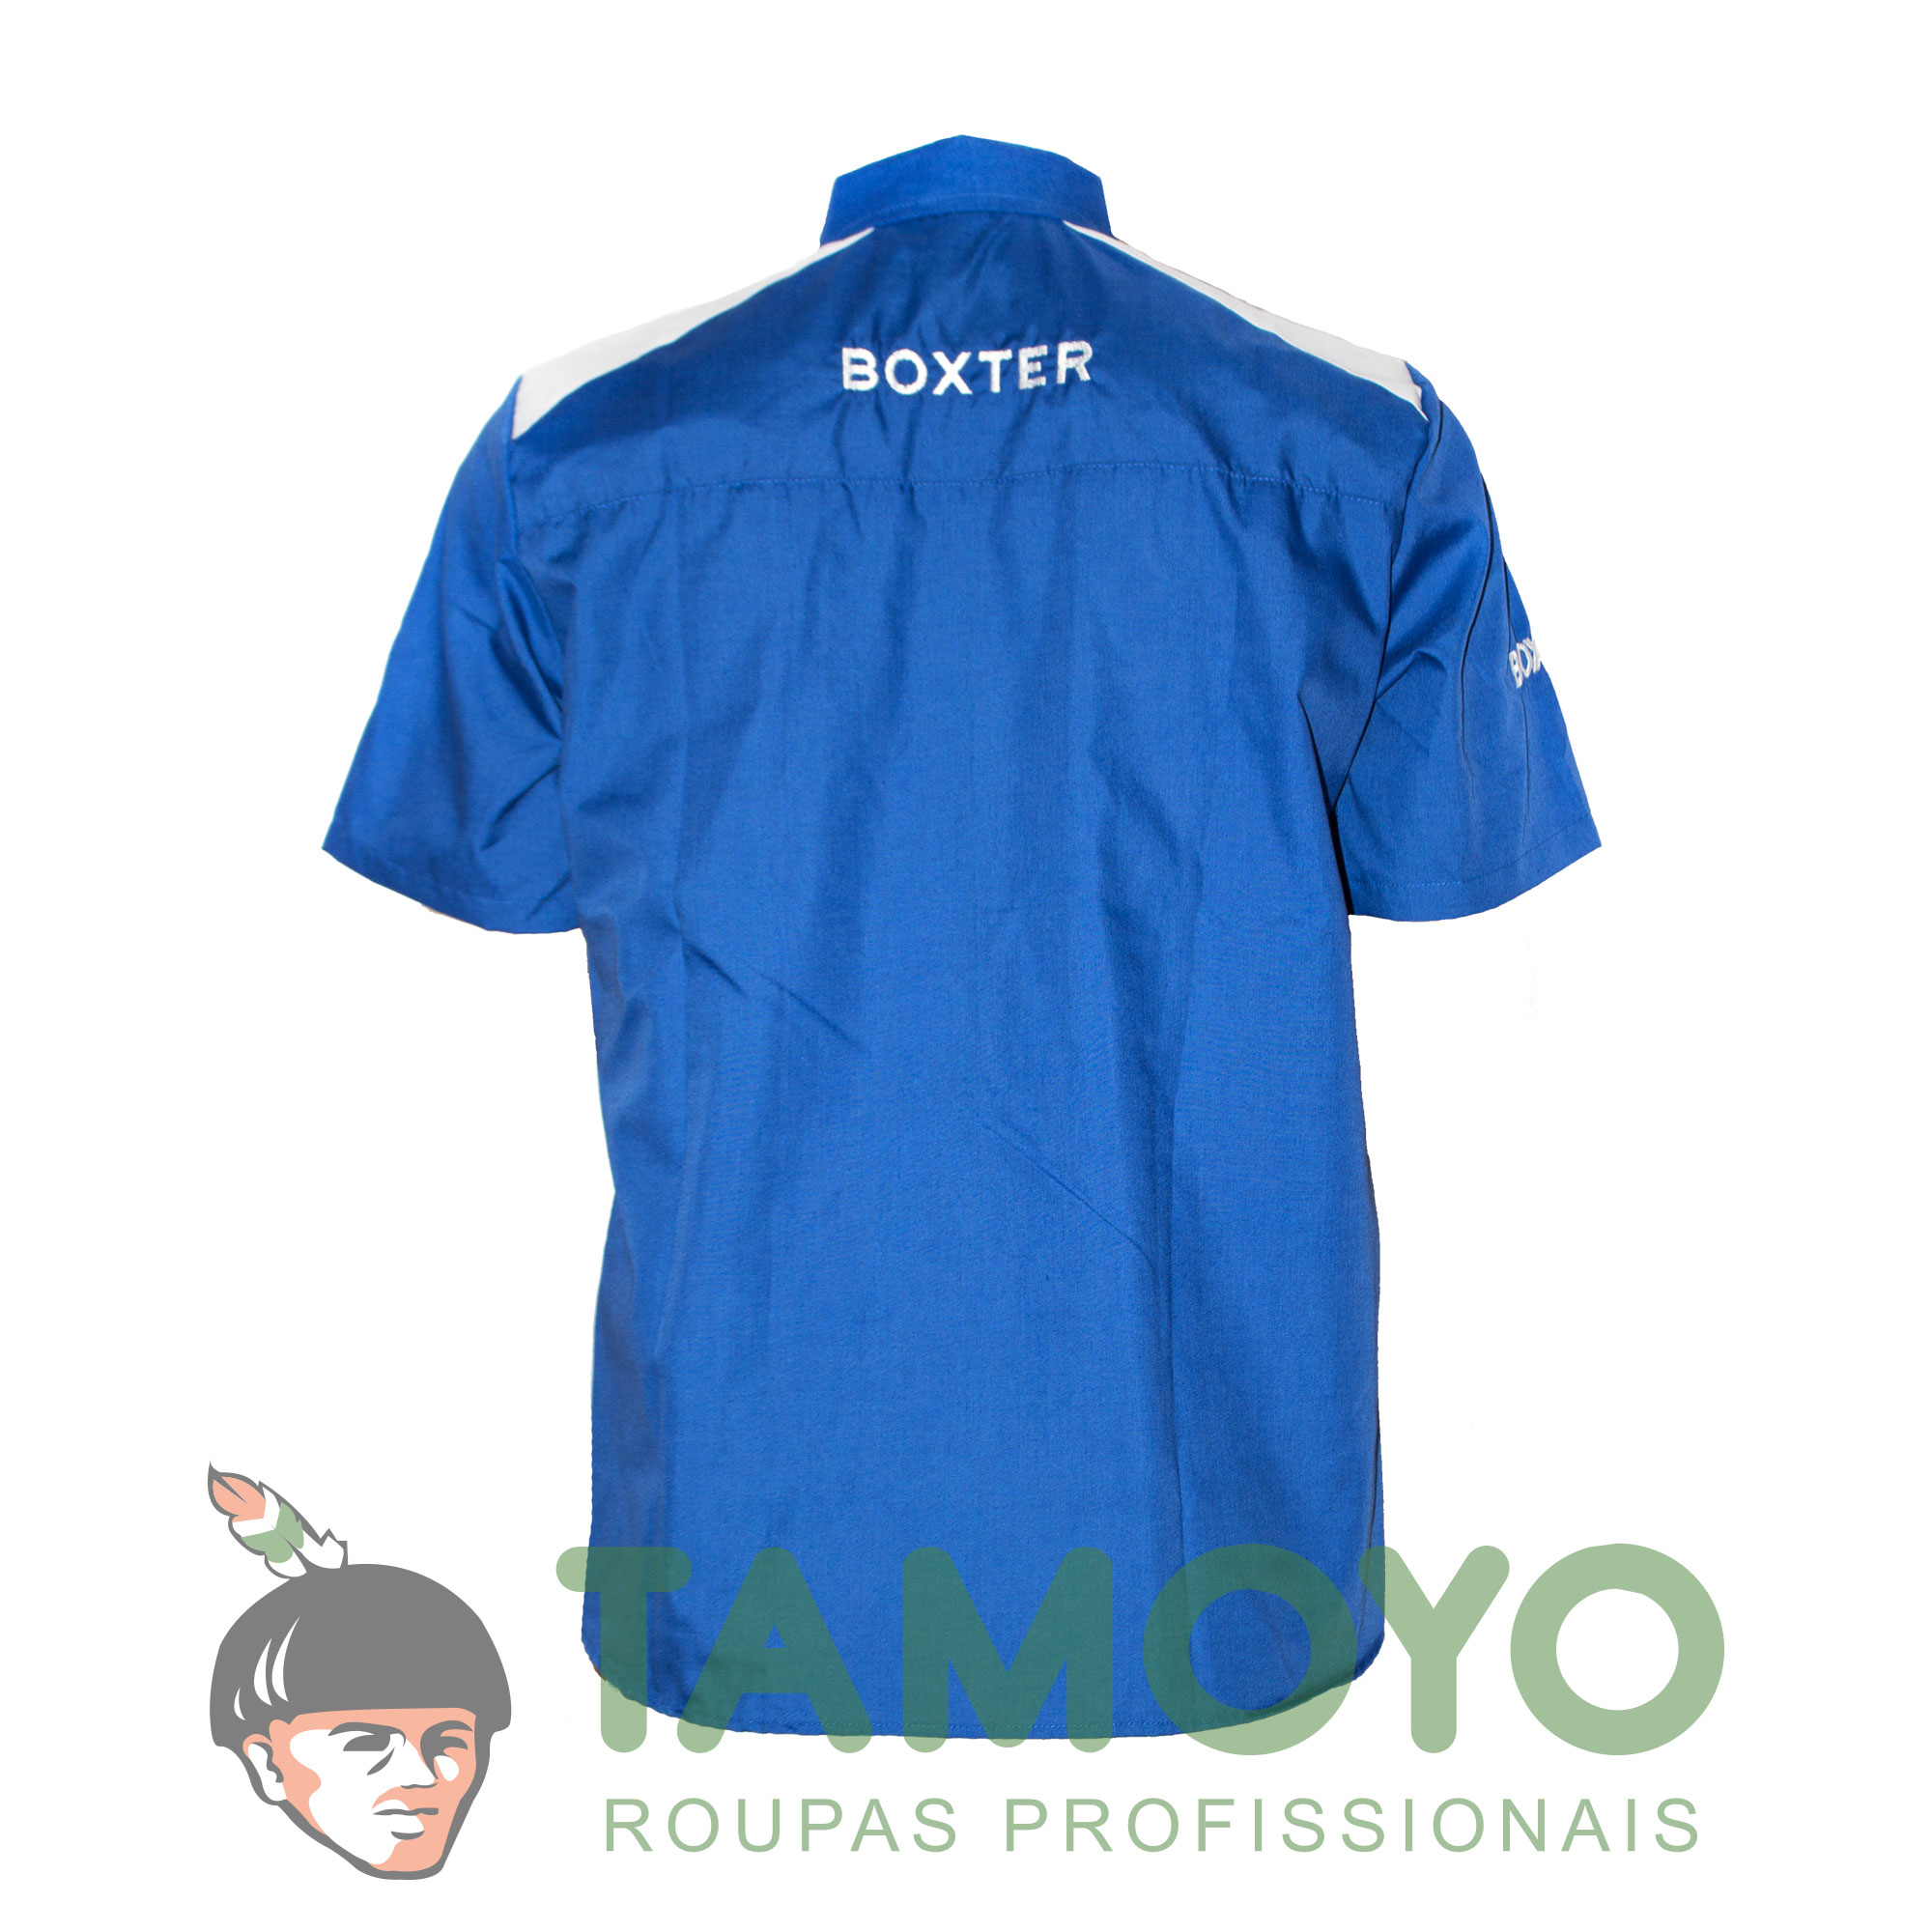 camisa-social-chefe-de-pista-masculino-roupas-tamoyo-uniformes-profissionais-c